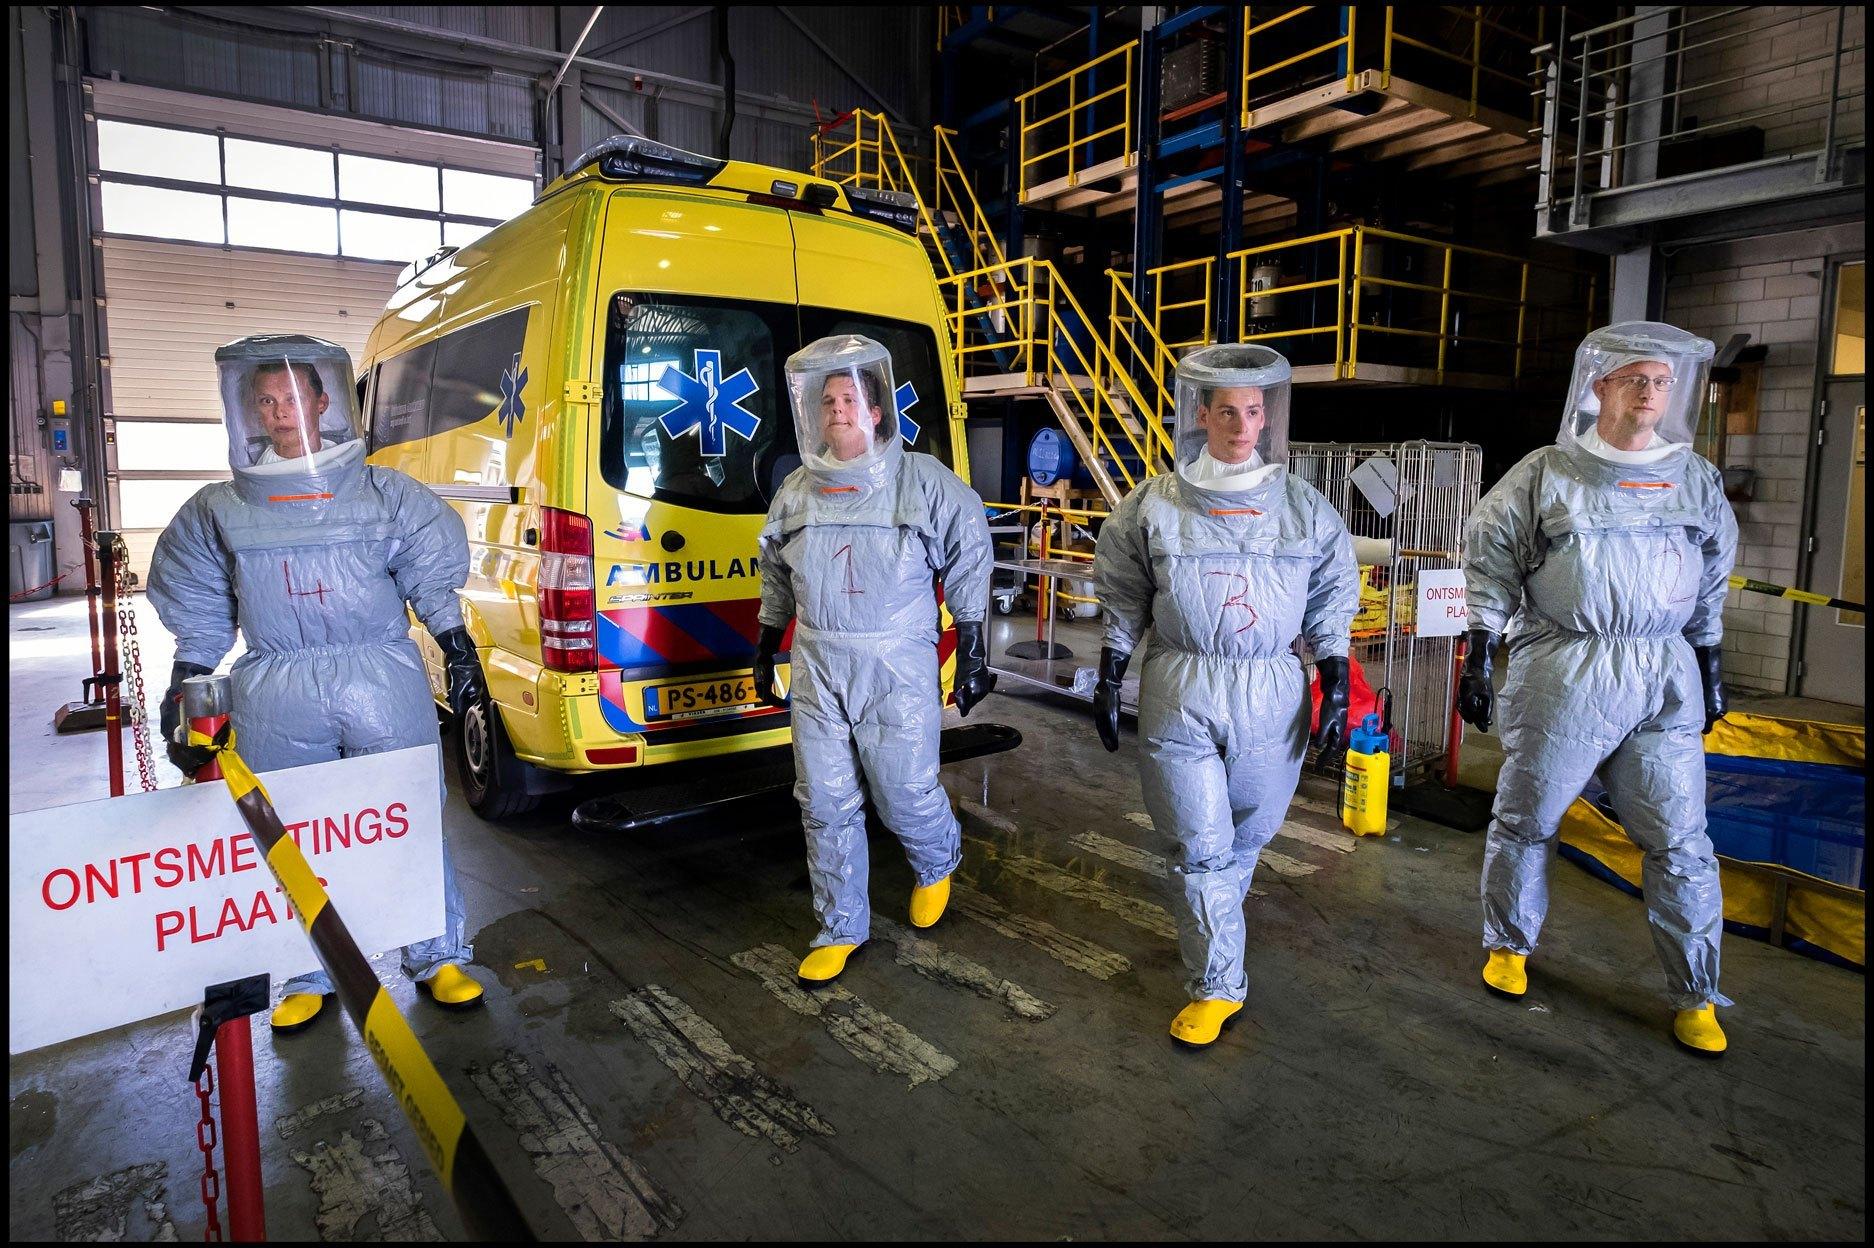 2-13960-NN-s-Ramon-van-Flymen-De-ambulance-wasstraat-in-Zaandam-005